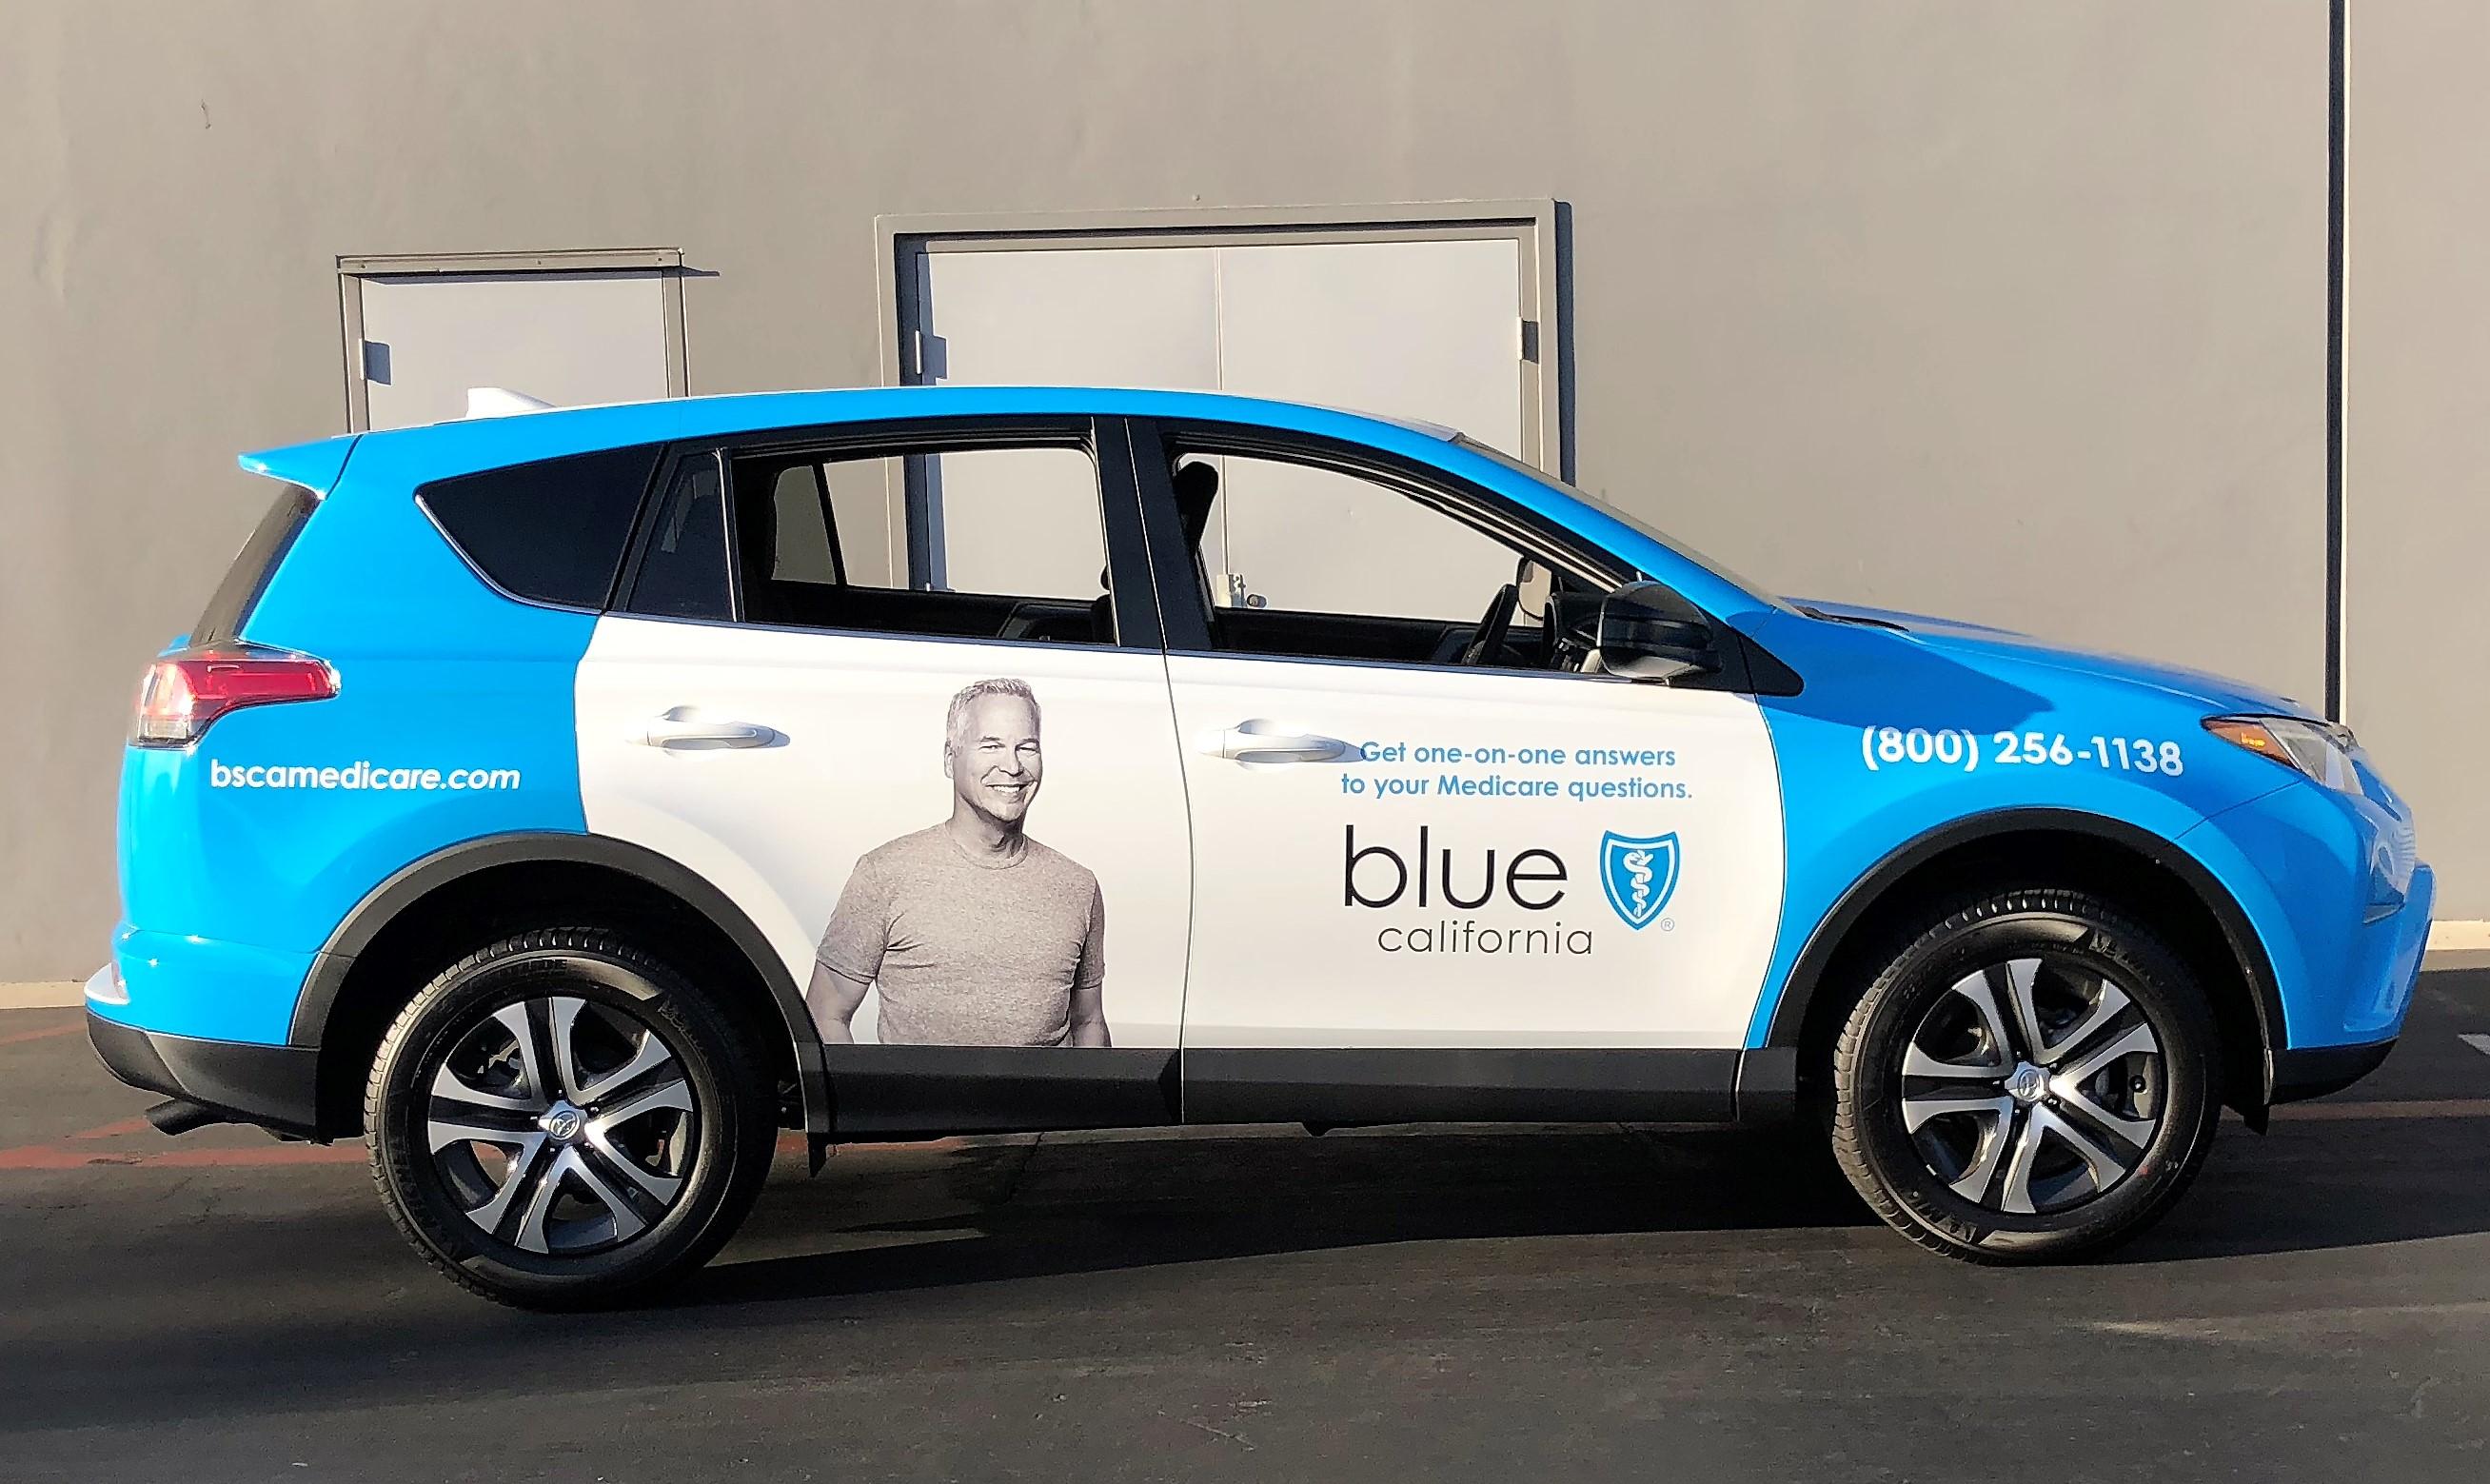 Custom Graphic Wrap Toyota Rav4 For Blue Shield California